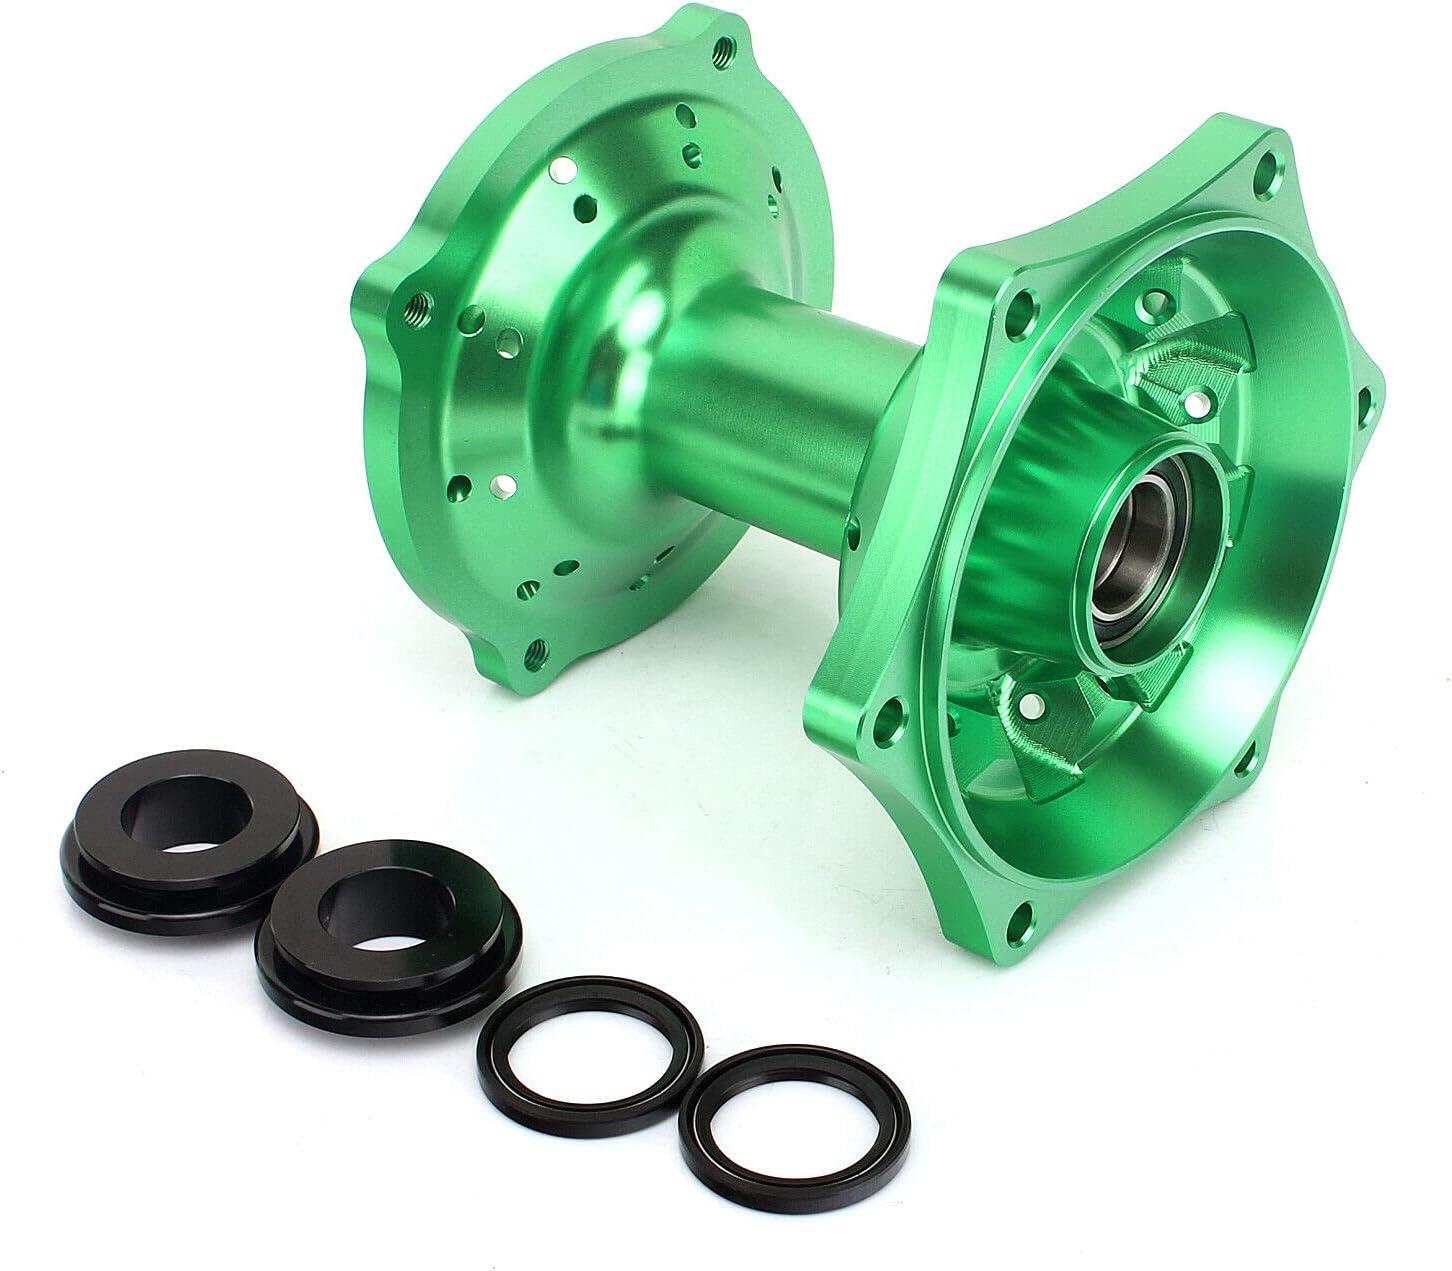 Sale SALE% OFF Smadmoto CNC Billet Rear Wheel Hub KXF KX 125 Green for Opening large release sale KAWASAKI